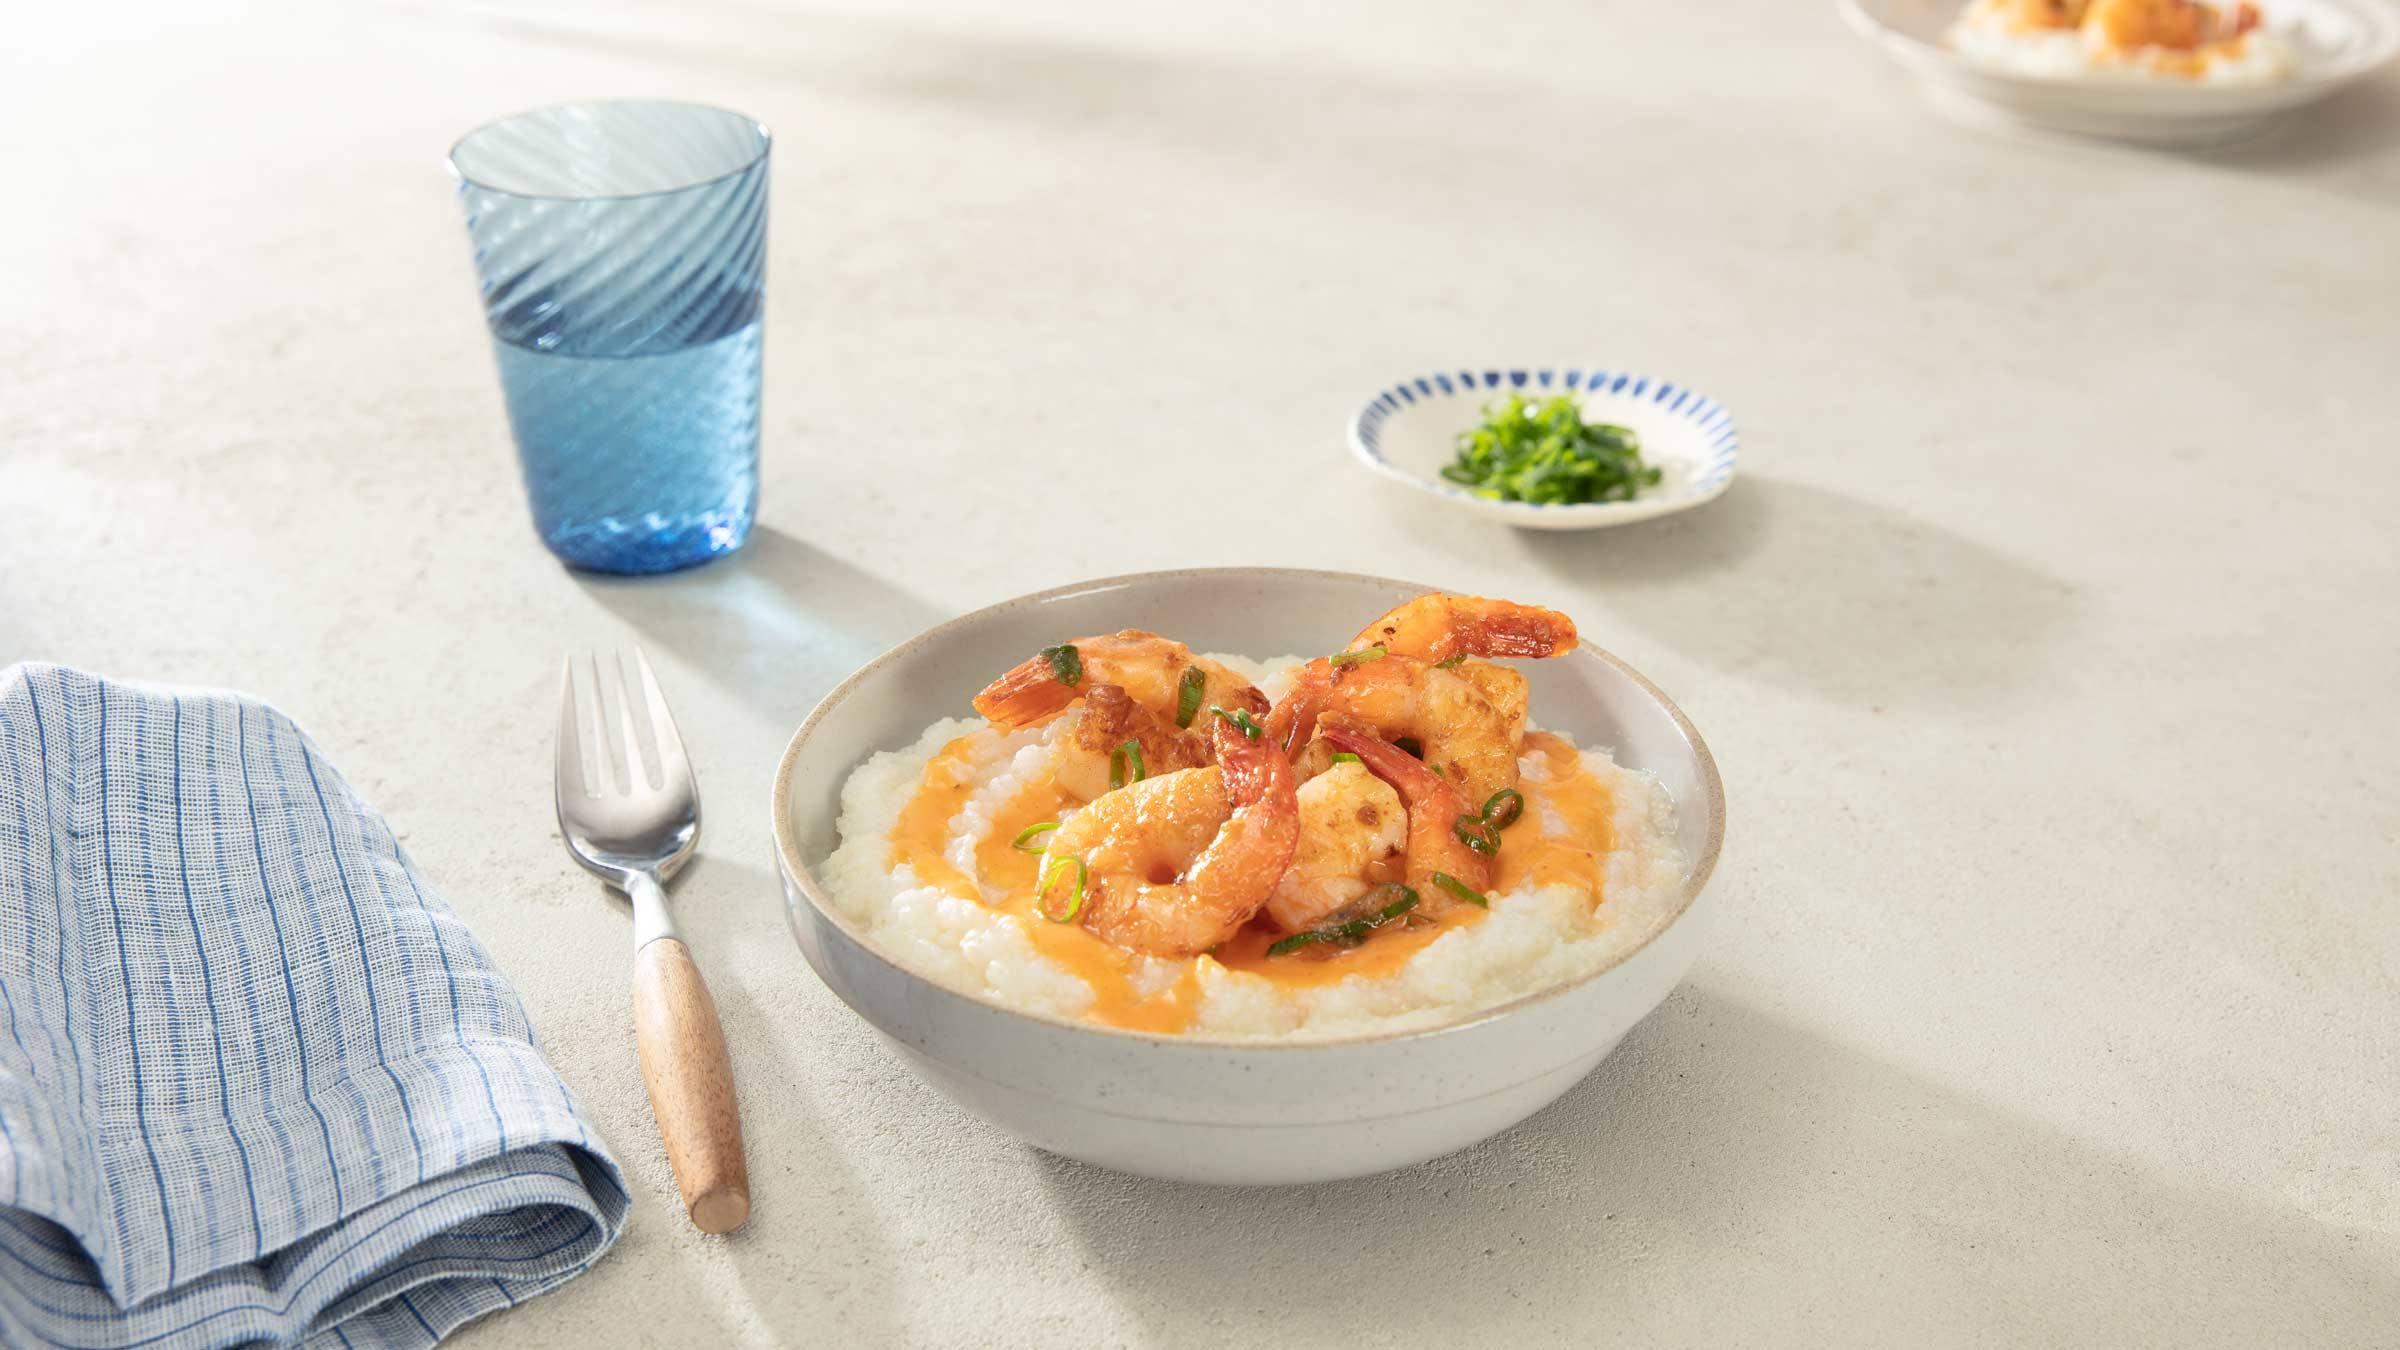 Chili Honey Shrimp & Grits